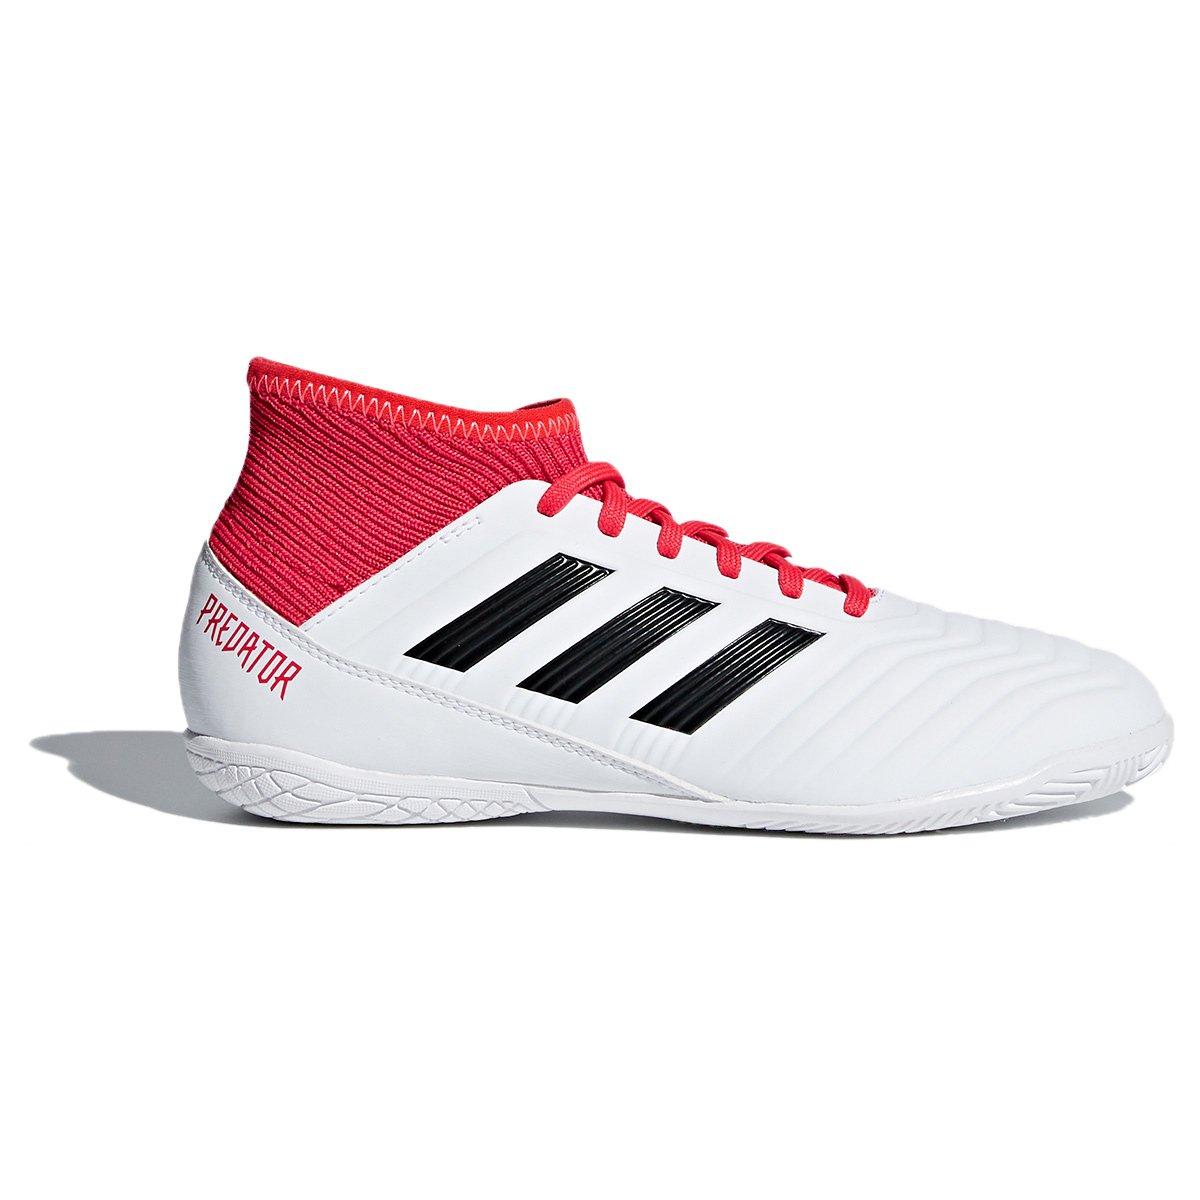 c570216c50d4f Chuteira Futsal Infantil Adidas Predator 18.3 - Compre Agora